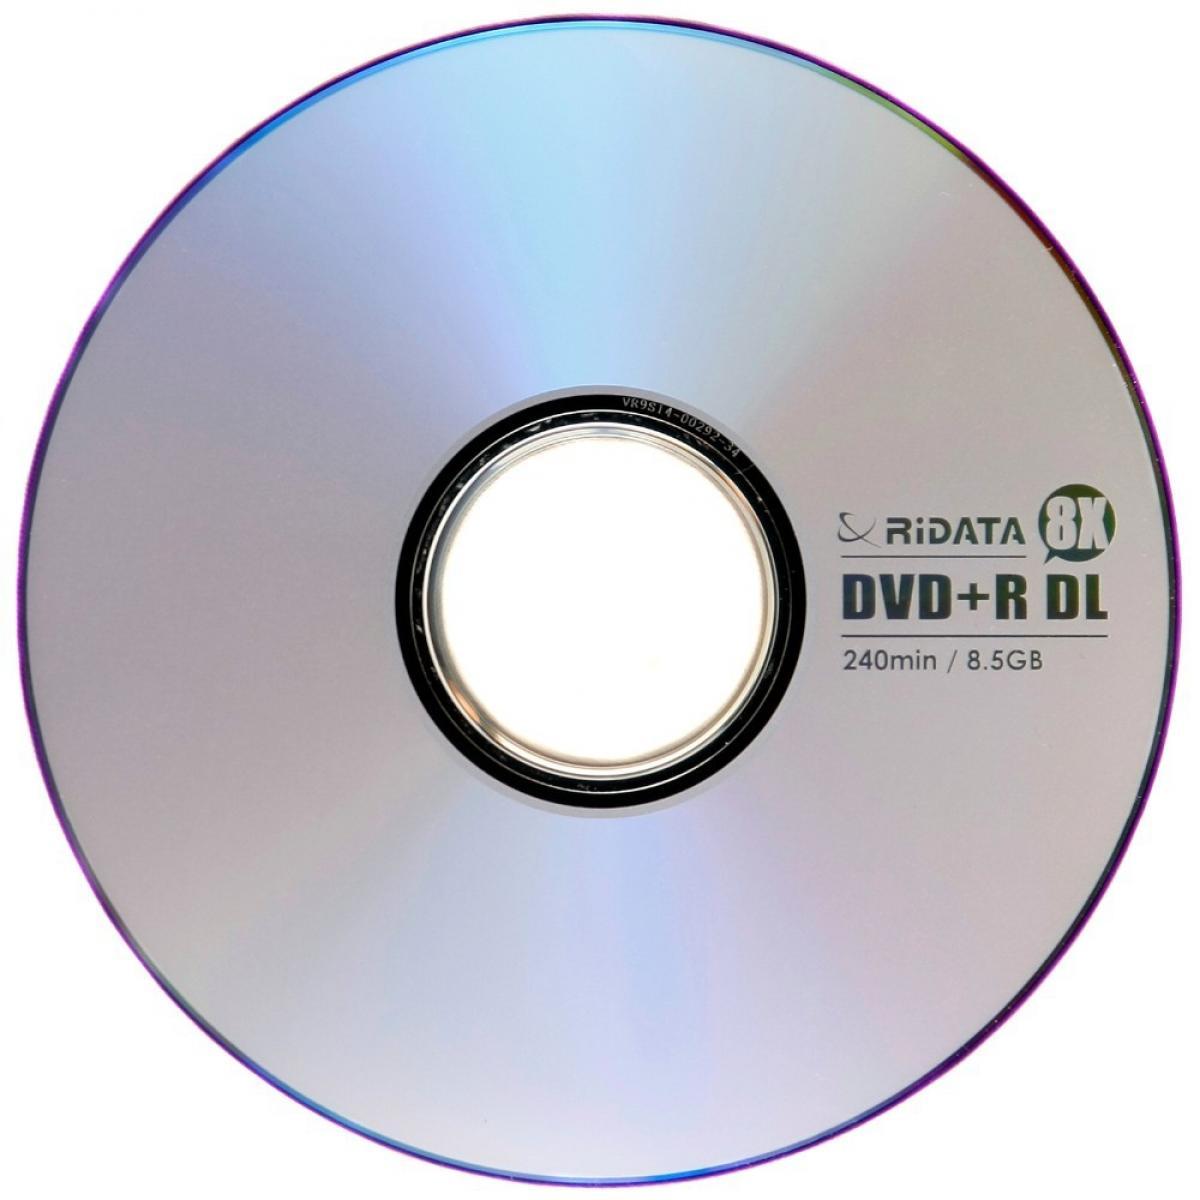 CD BLANK DVD+R DOUBLE LAYER RIDATA 8.5G 8X ,Blank CD & DVD